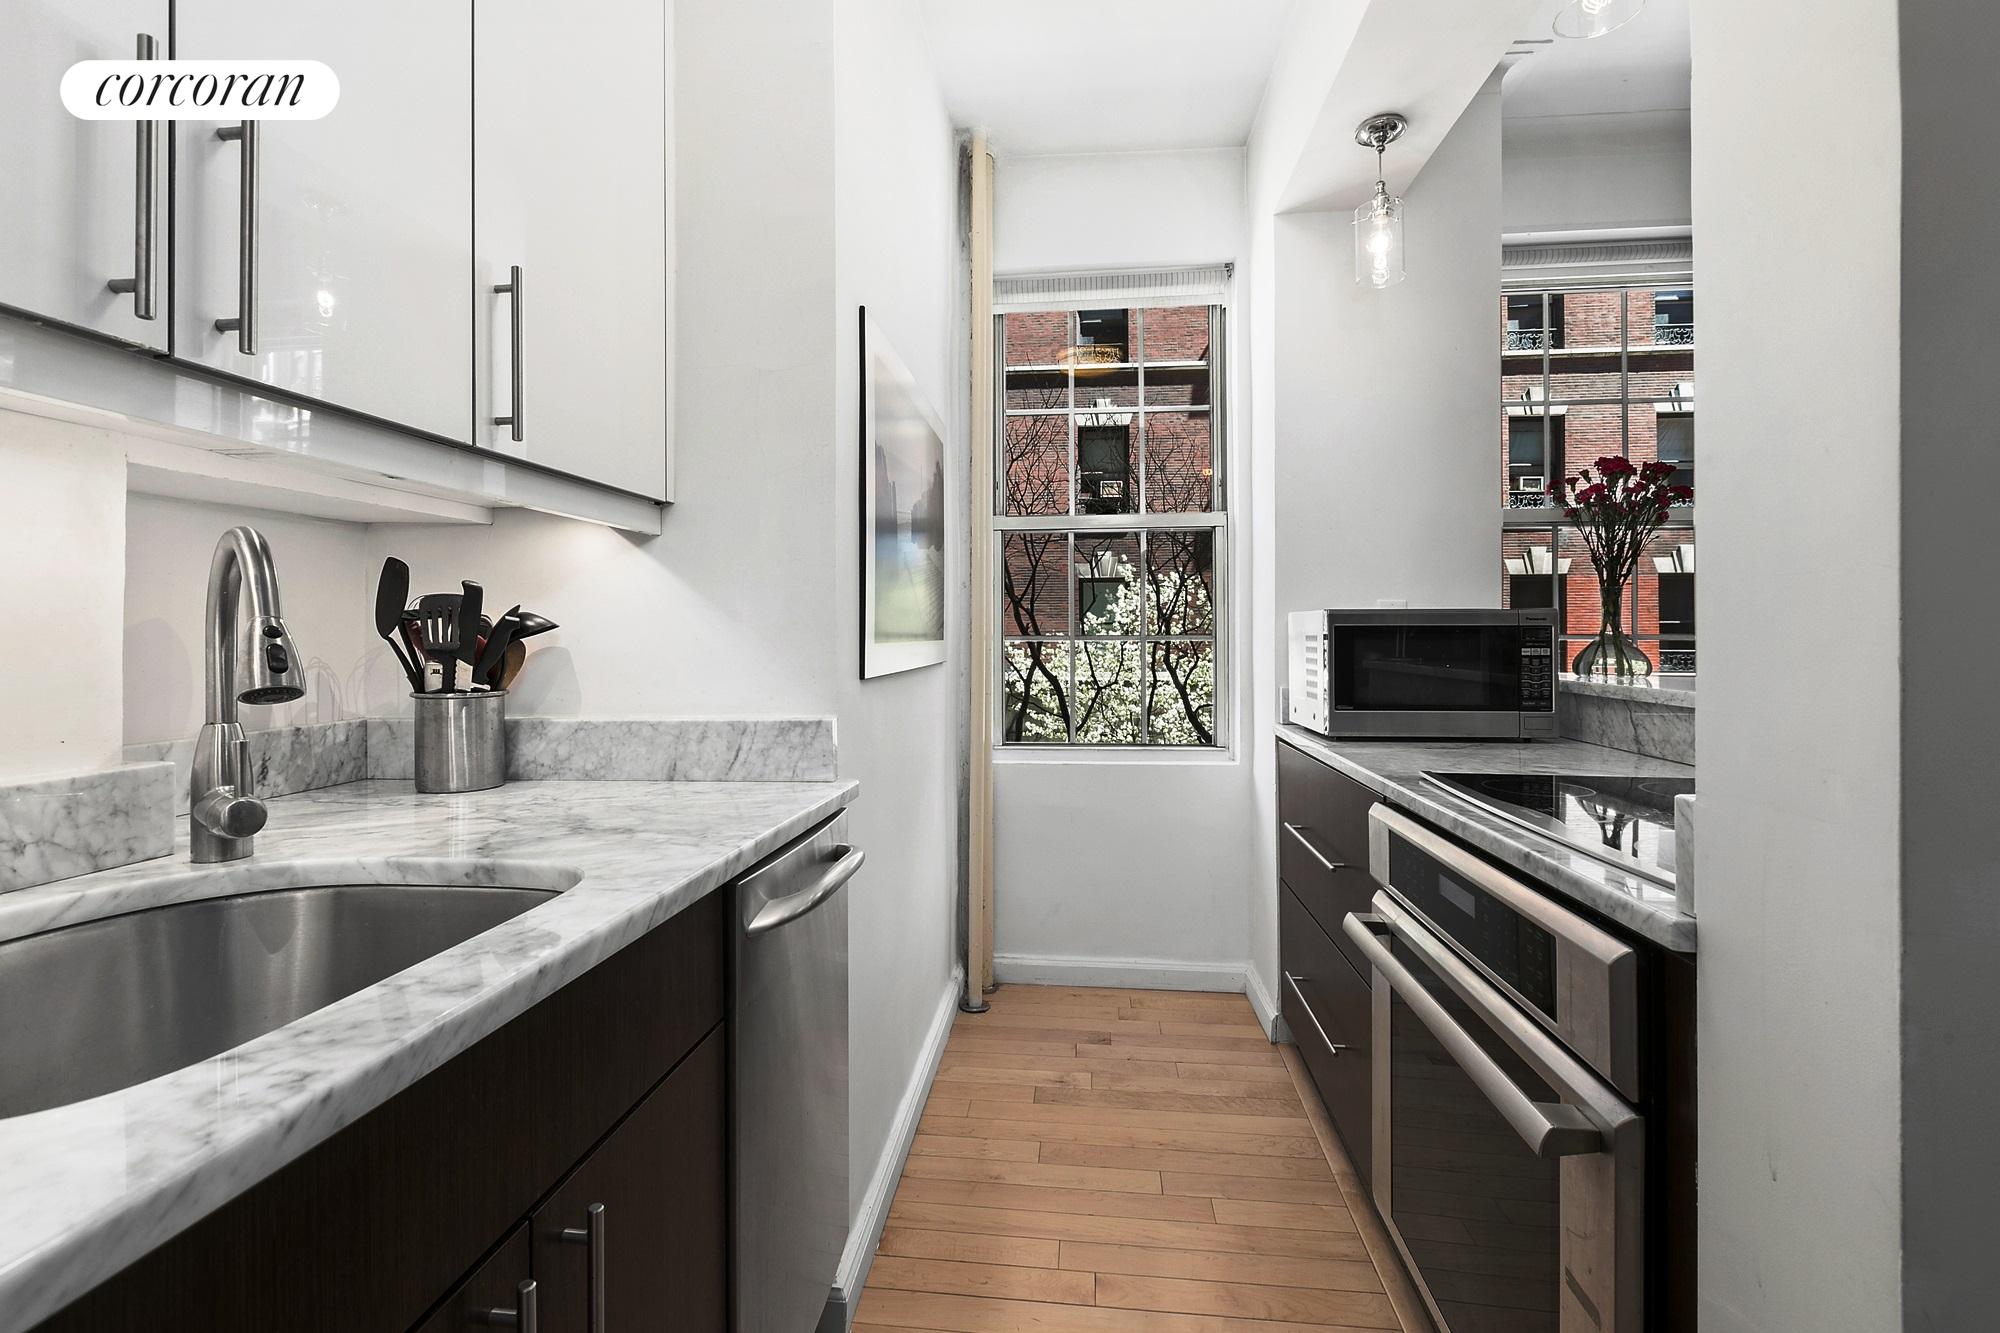 Corcoran, 41 Fifth Avenue, Apt. 4C, Greenwich Village Real Estate ...